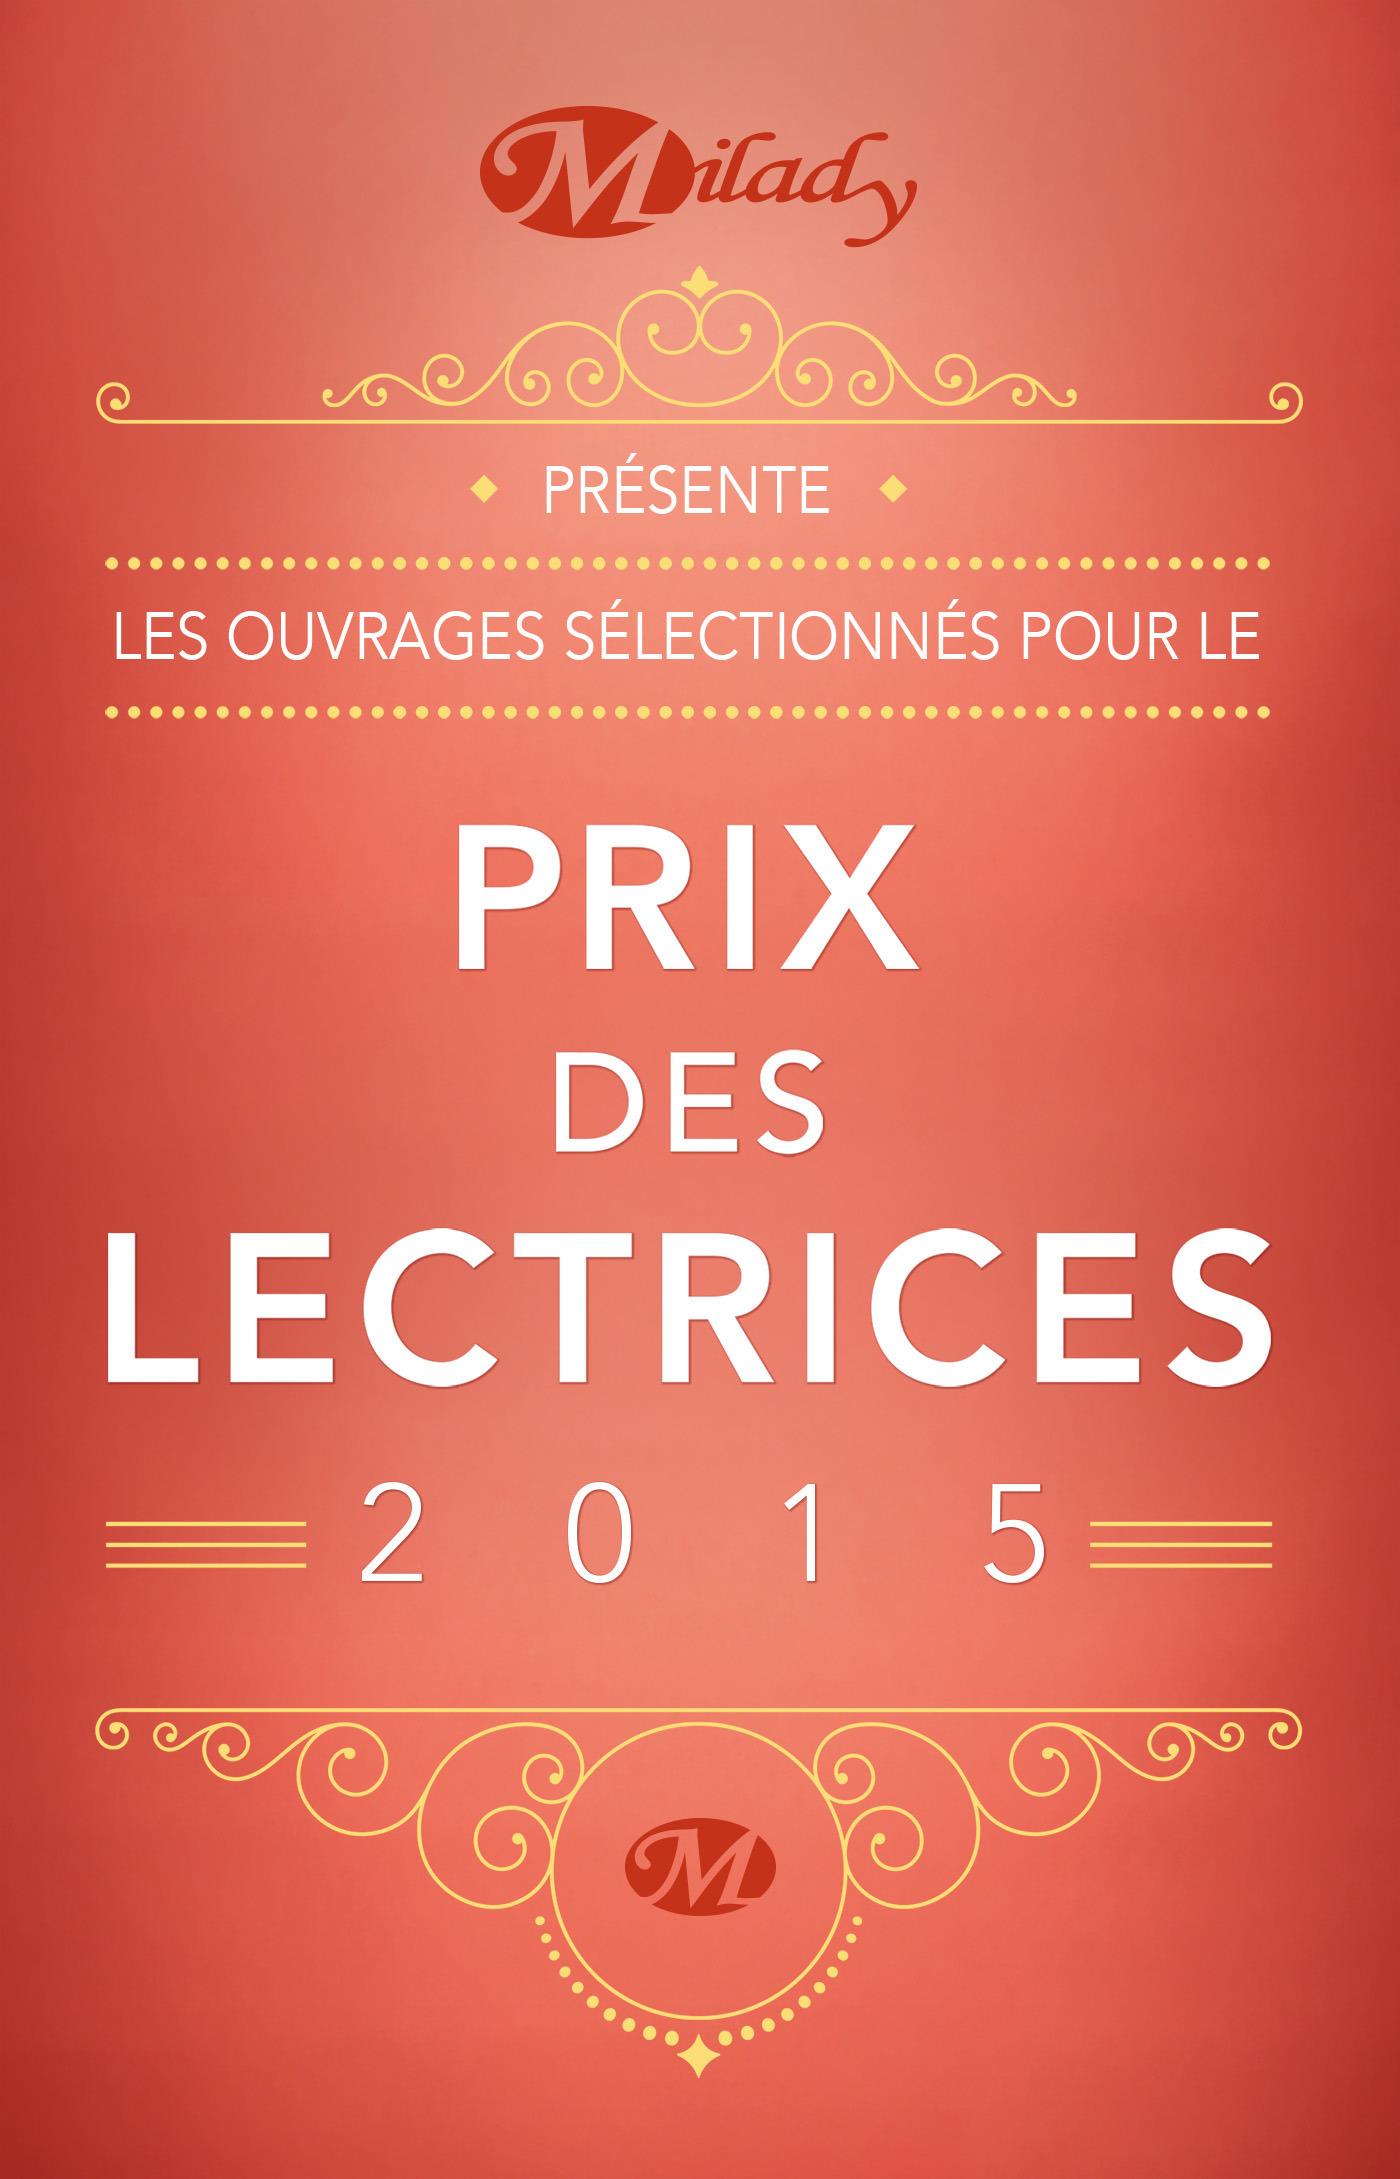 Prix des lectrices Milady 2015 ; extraits offerts